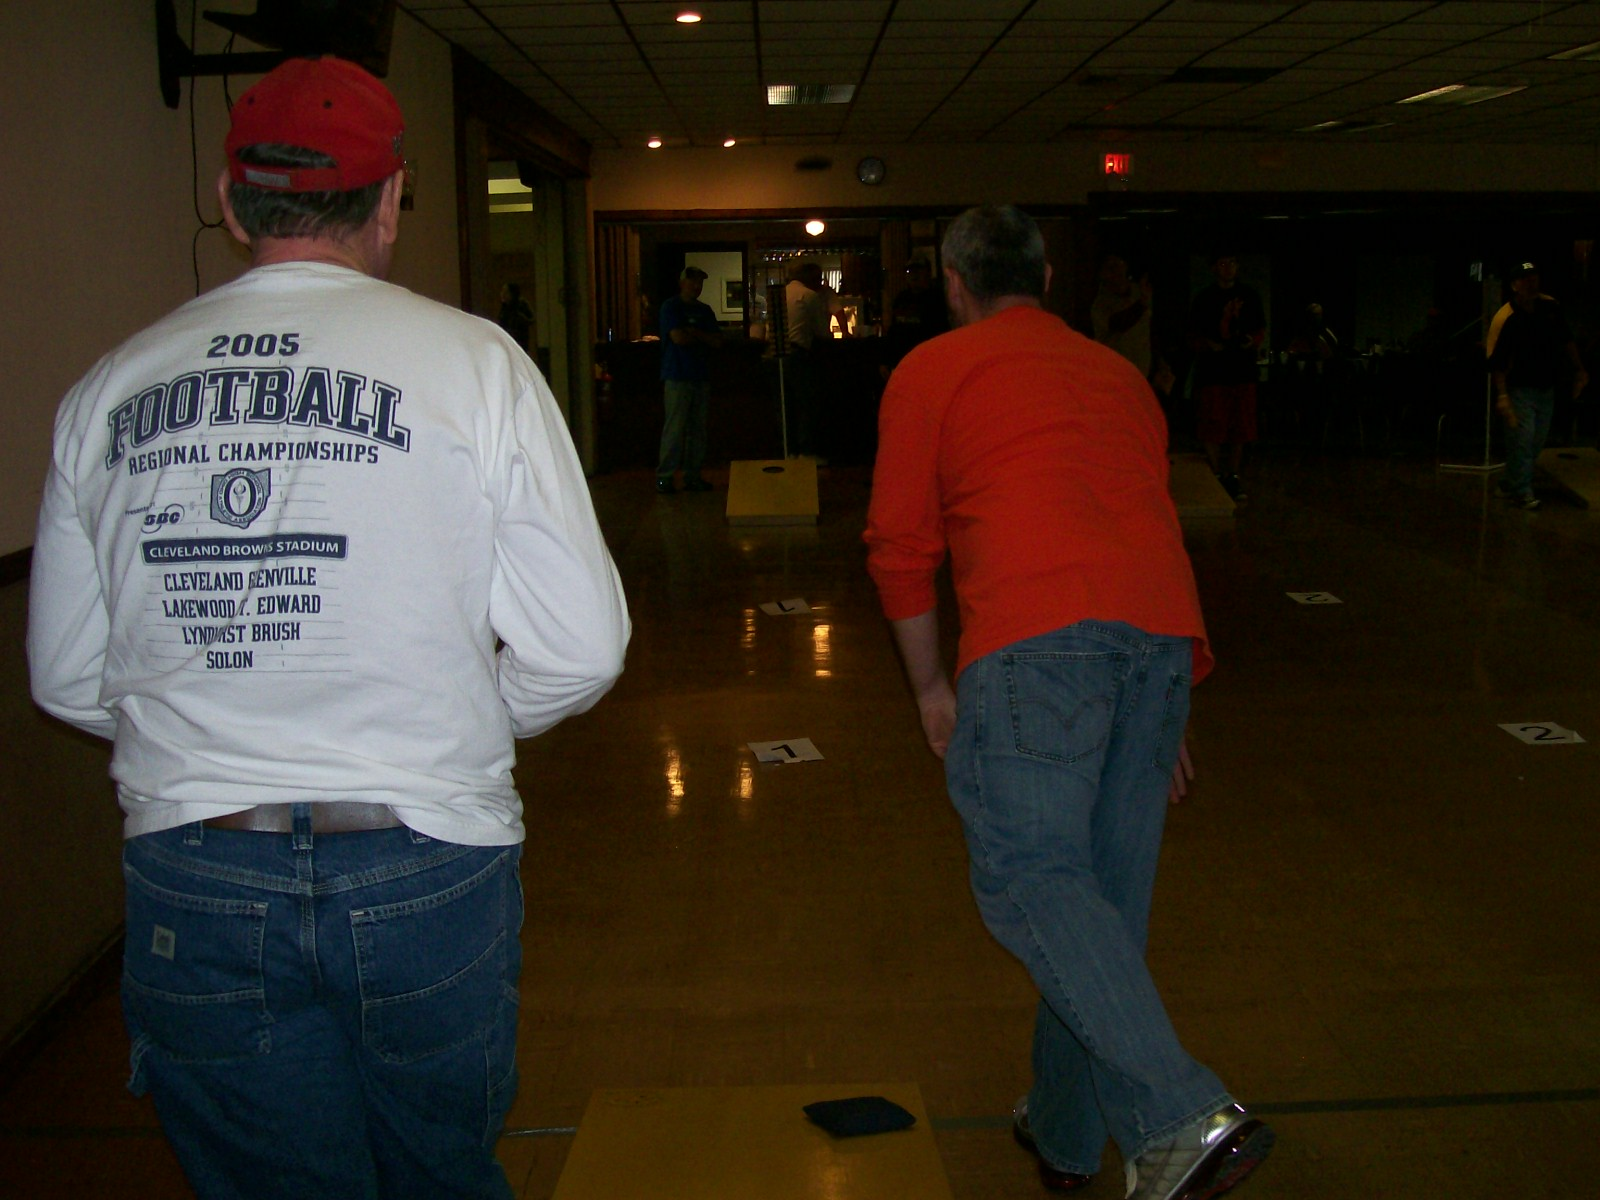 Tom Bobo and Ryan Birge (Jan. 15, 2011)